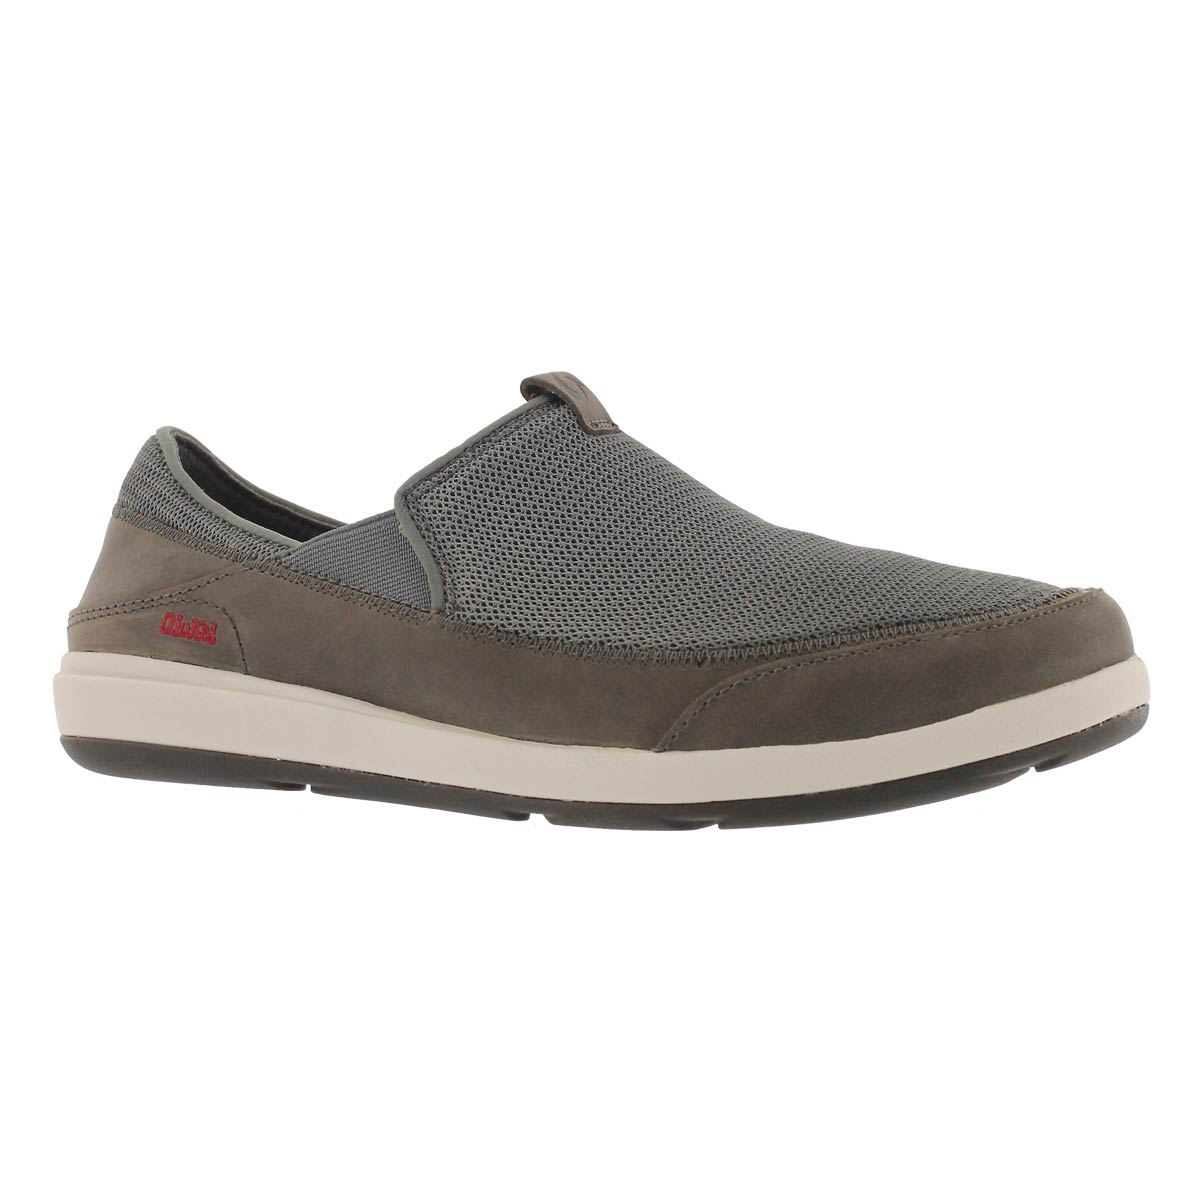 Mns Makia charcoal slip on casual shoe